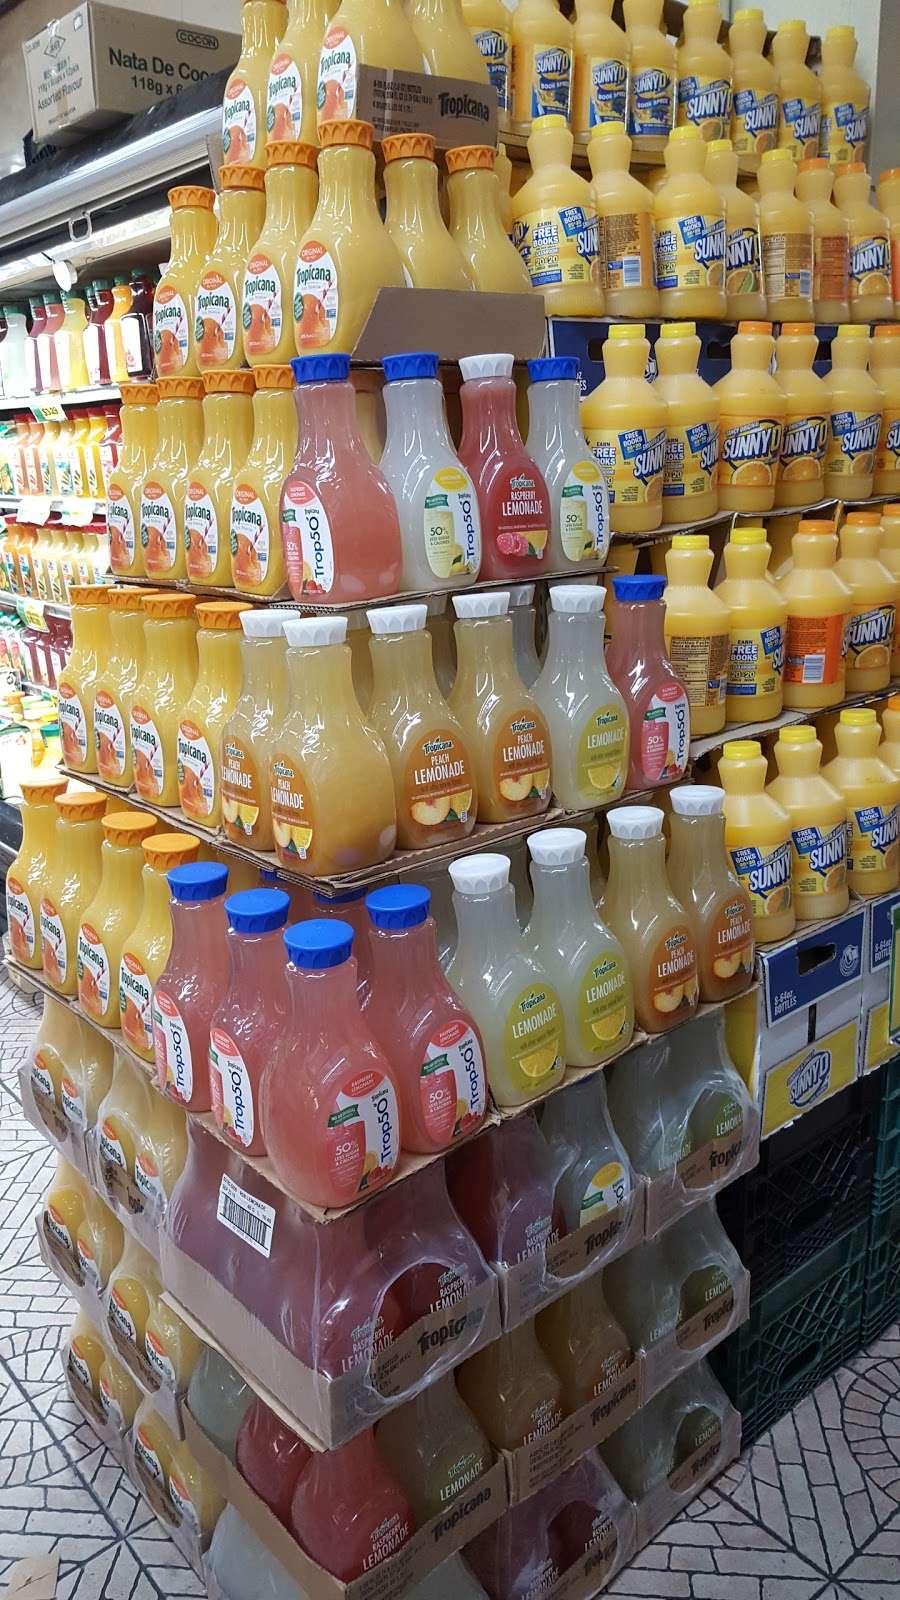 Golden Mango Supermarkets - supermarket  | Photo 2 of 10 | Address: 1871 Rockaway Pkwy, Brooklyn, NY 11236, USA | Phone: (718) 531-0205